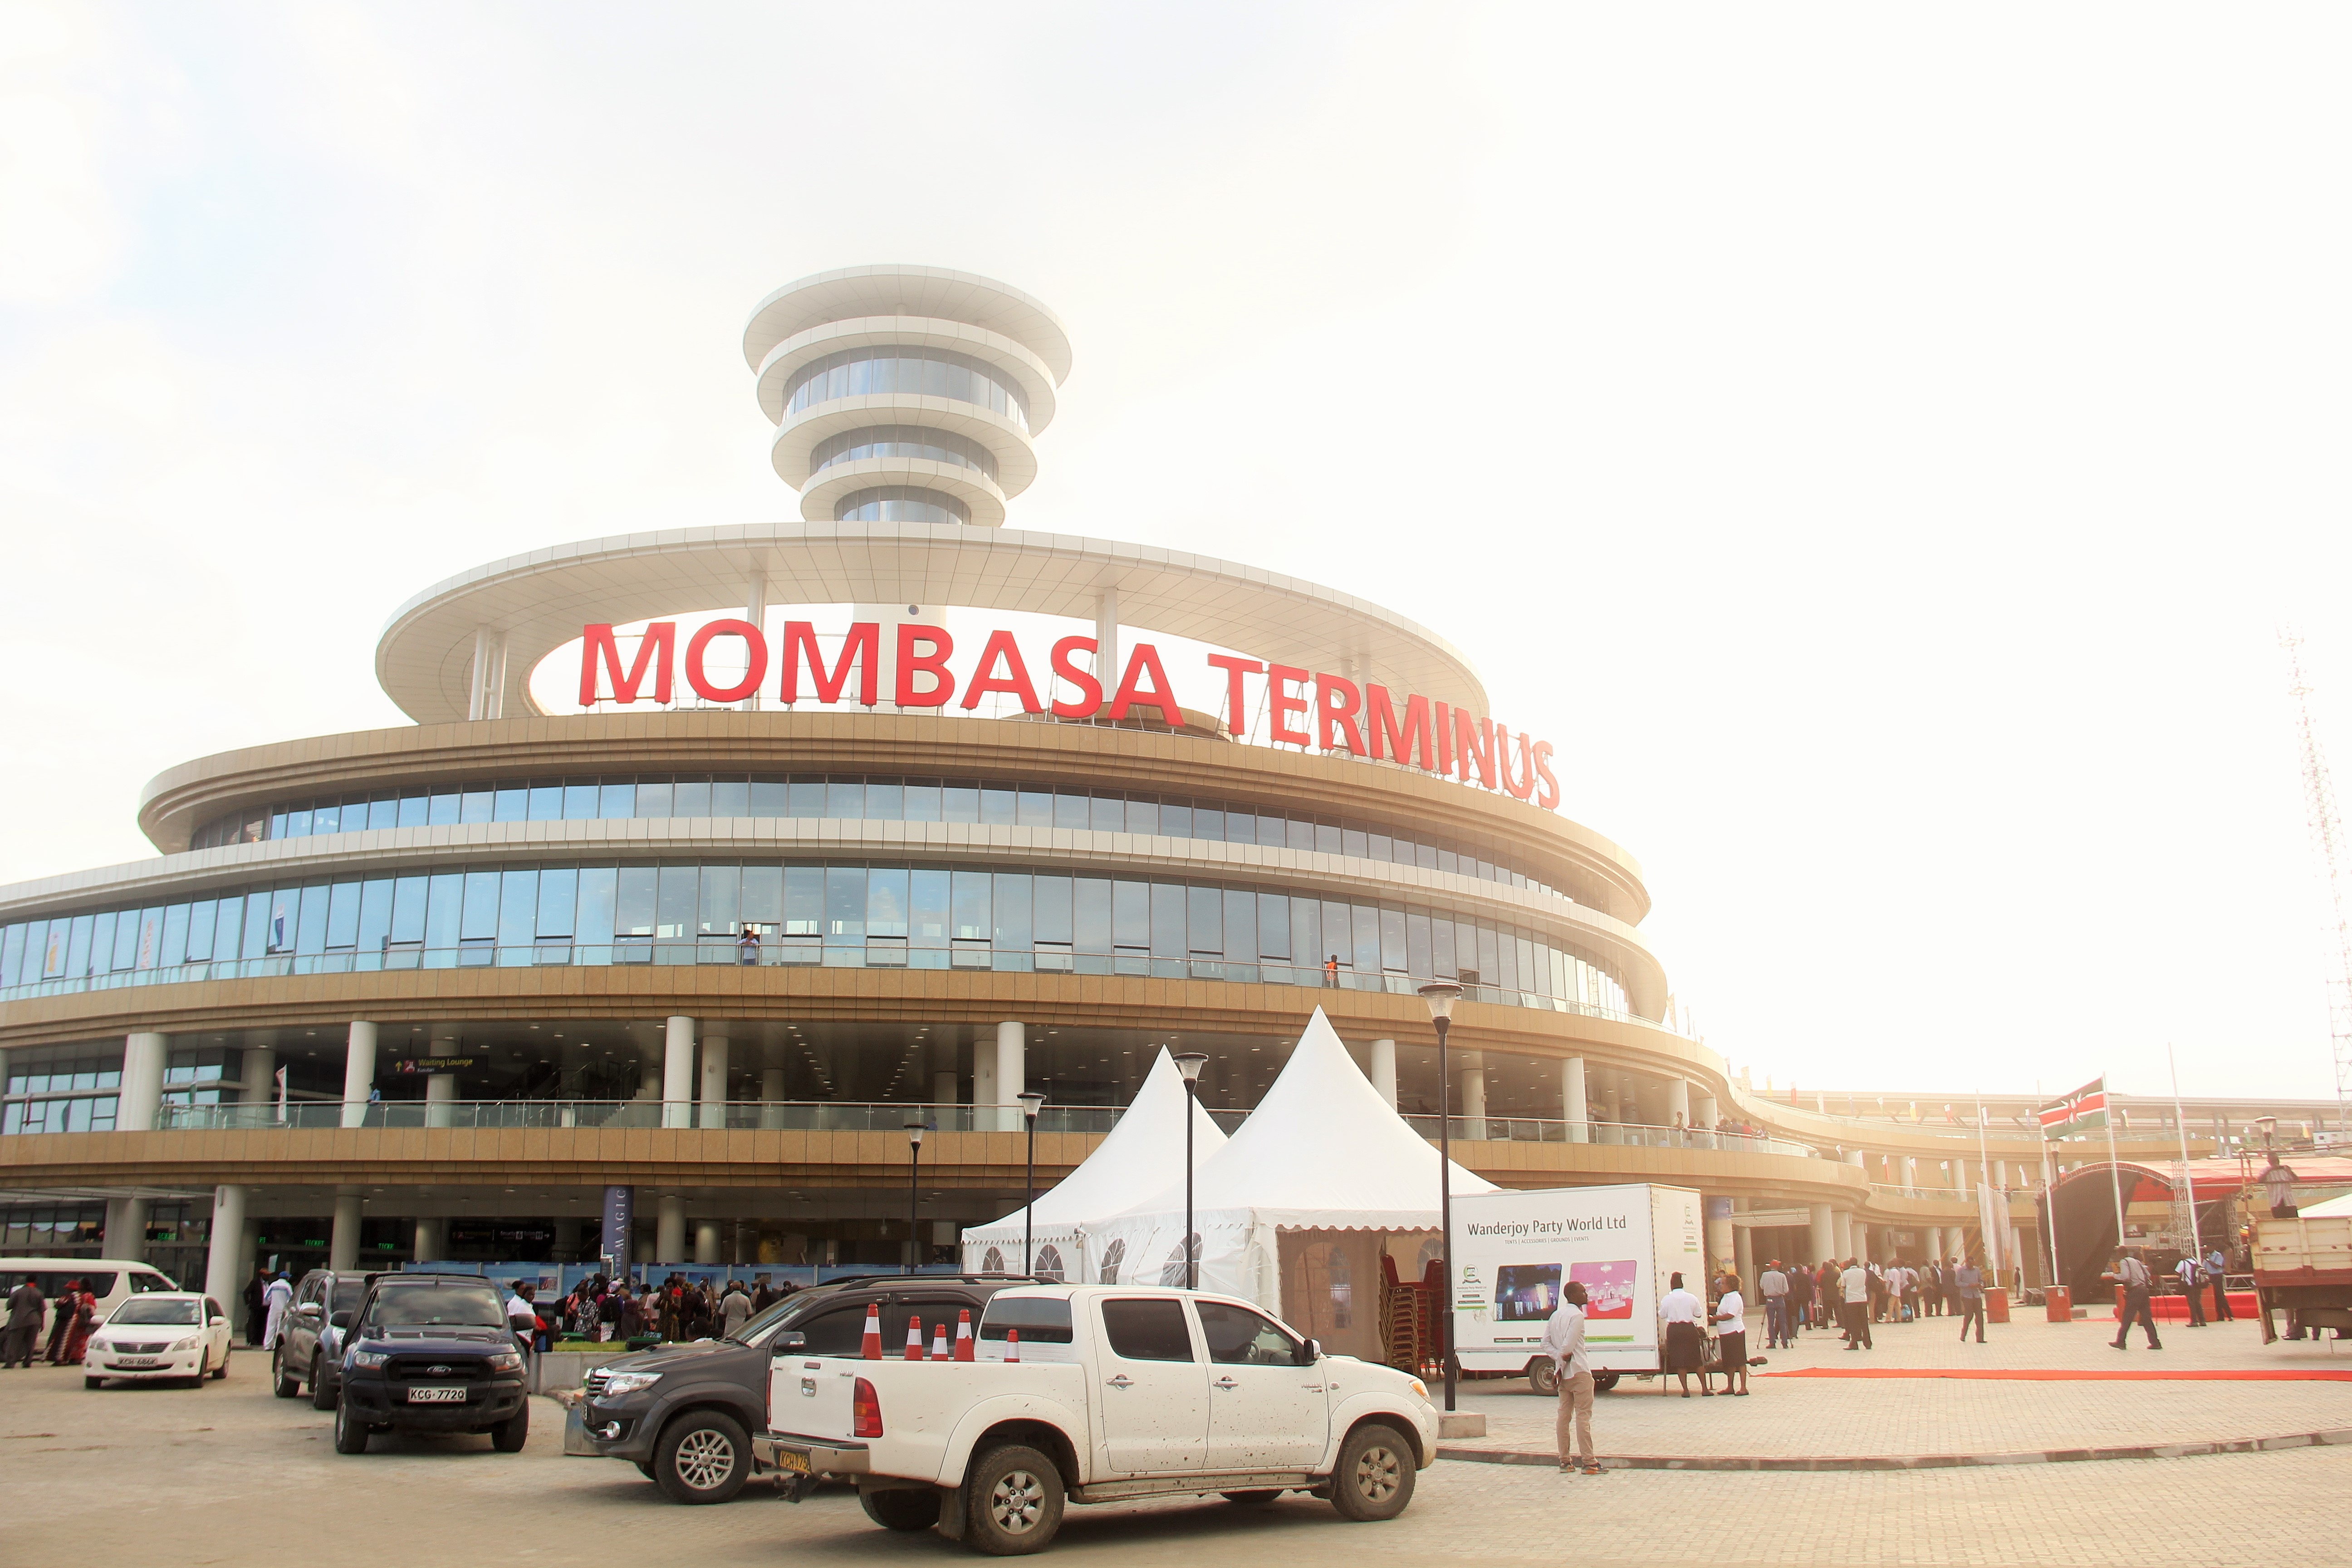 Mombasa terminus.